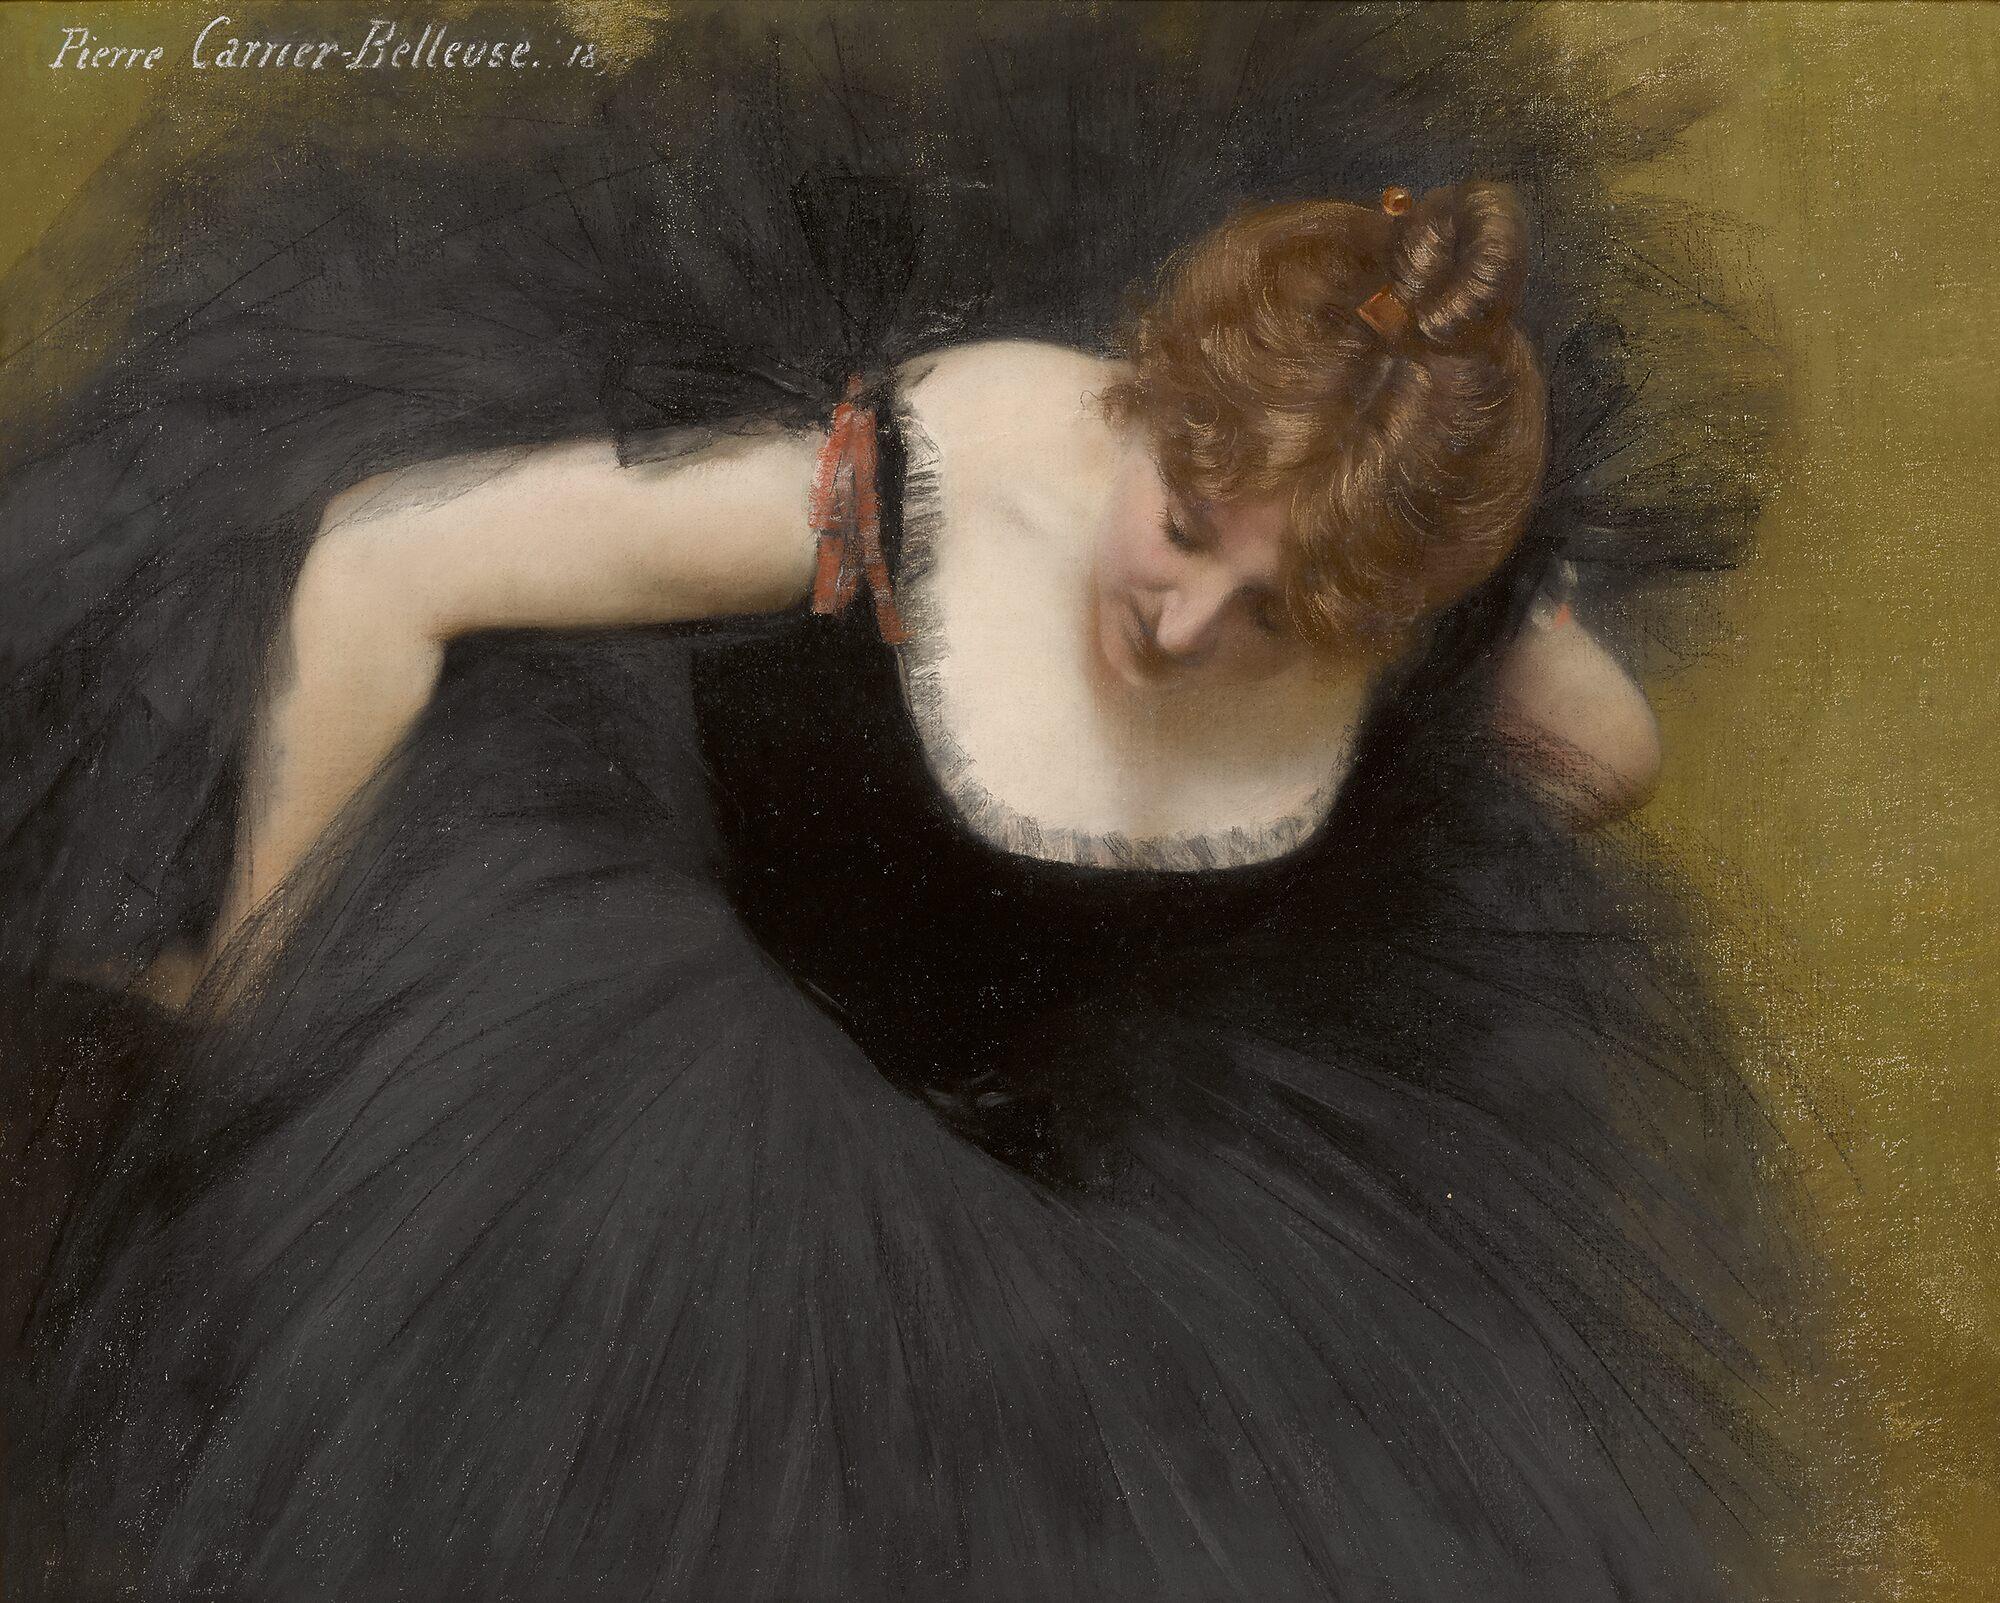 Pierre Carrier-Belleuse 1895 b